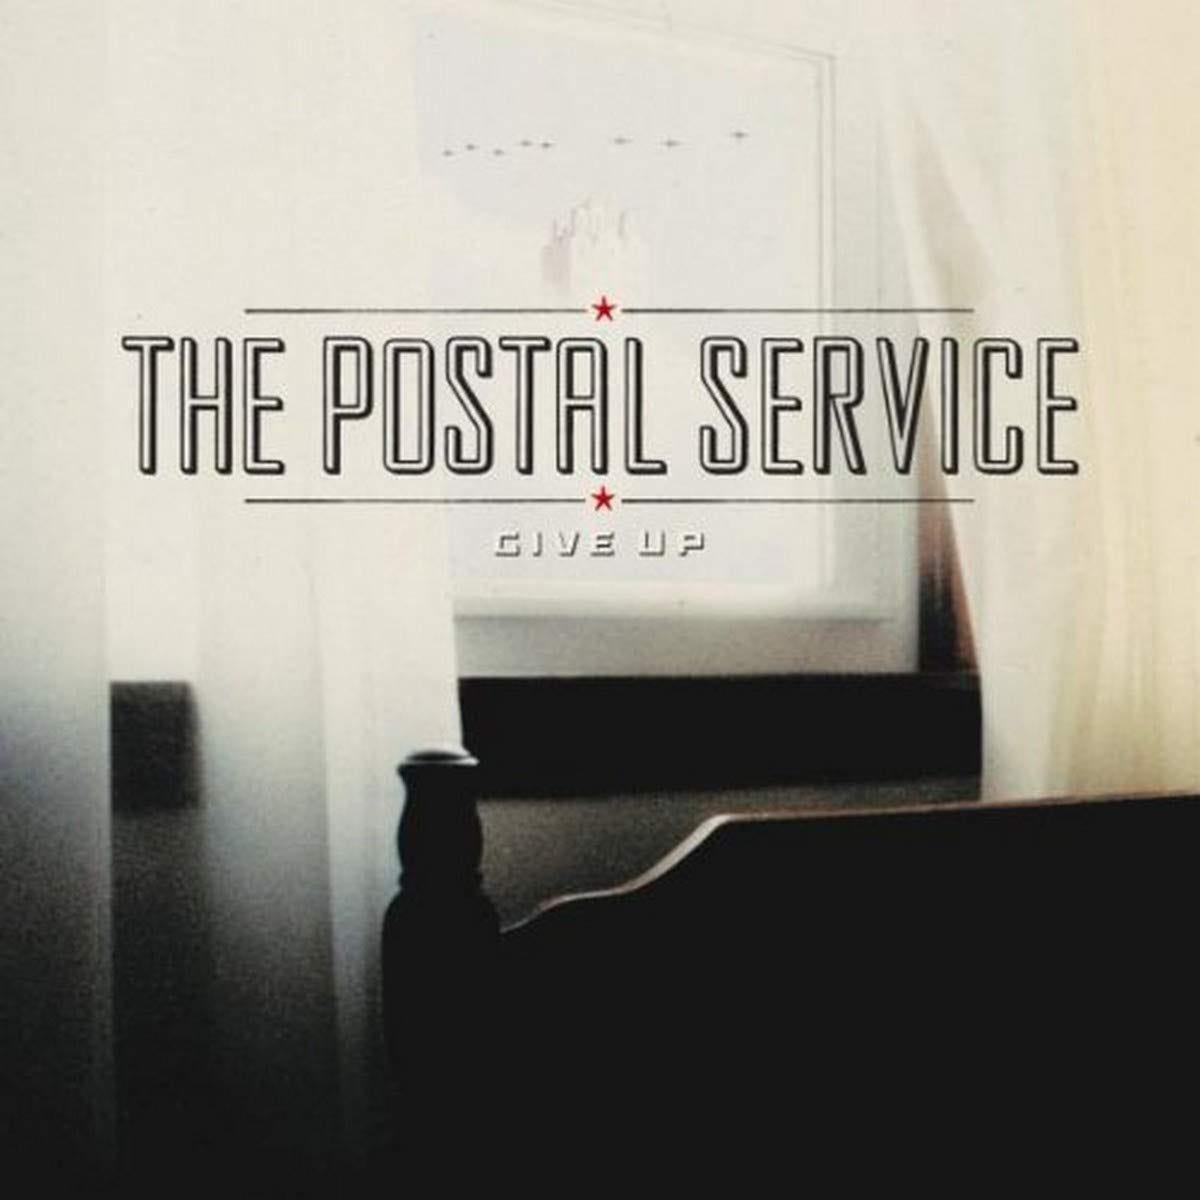 Postal Service - Give Up - Amazon.com Music